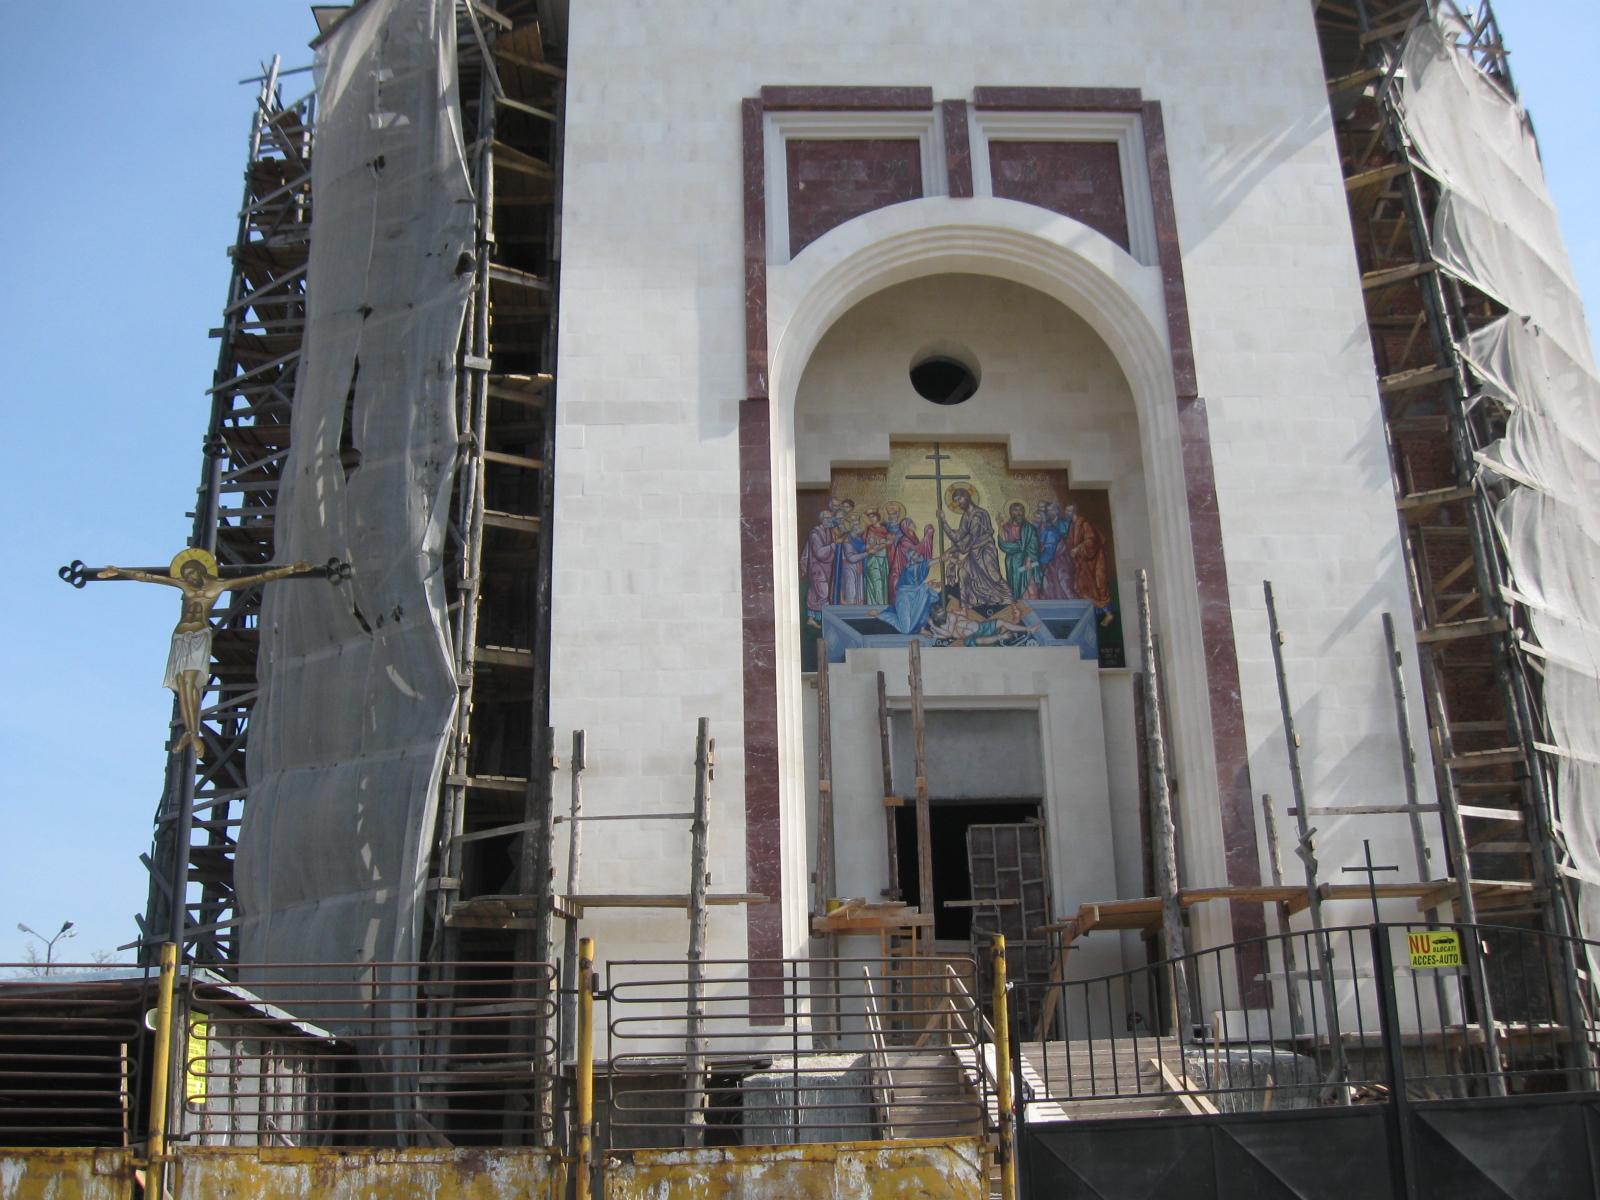 Catedrala Ortodoxa Oradea fatada